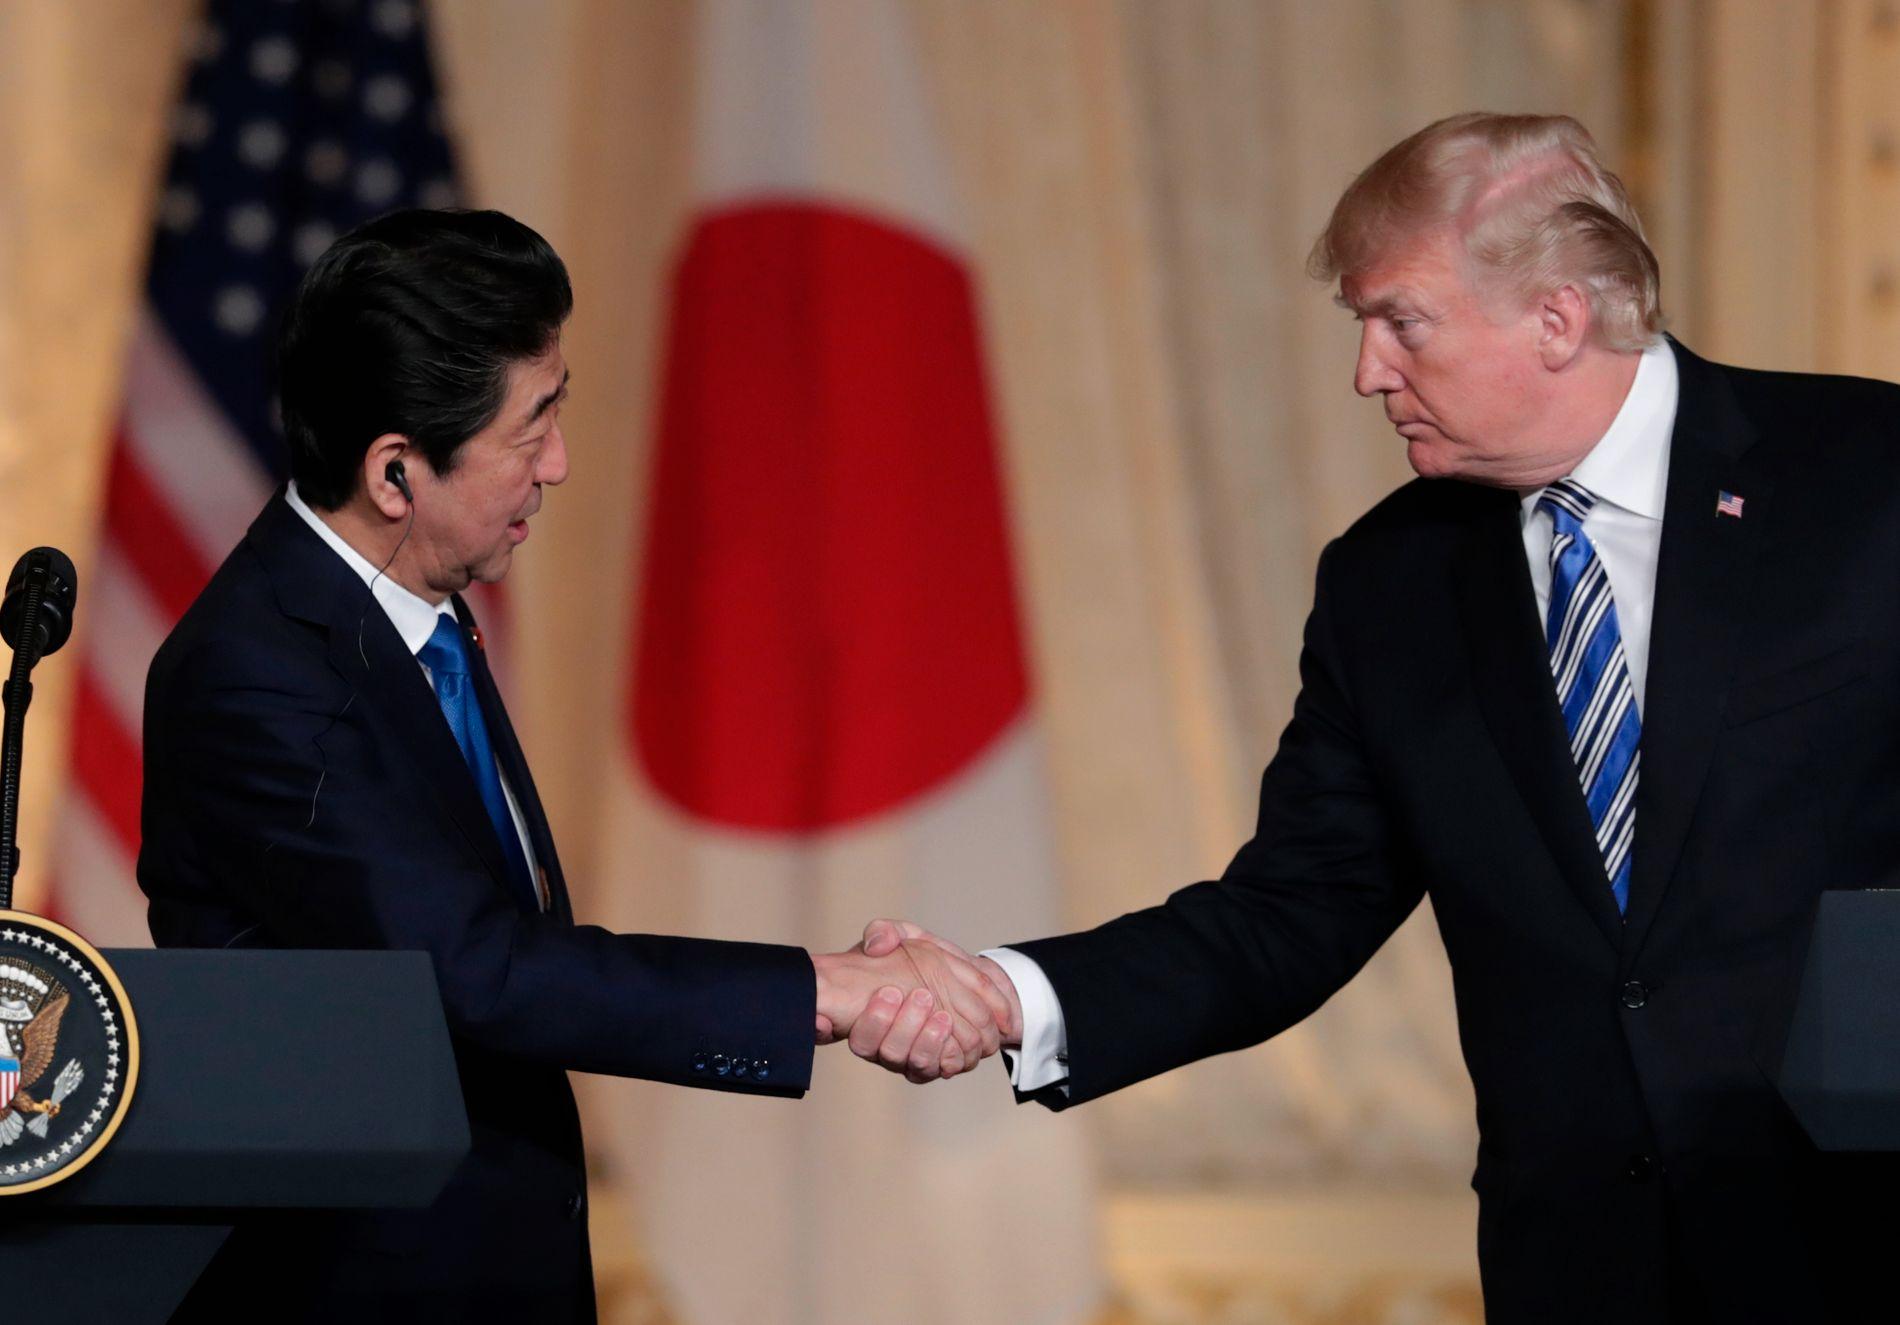 MØTE: Japans statsminister Shinzo Abe og USAs president Donald Trump under pressekonferansen i Florida onsdag. Foto: